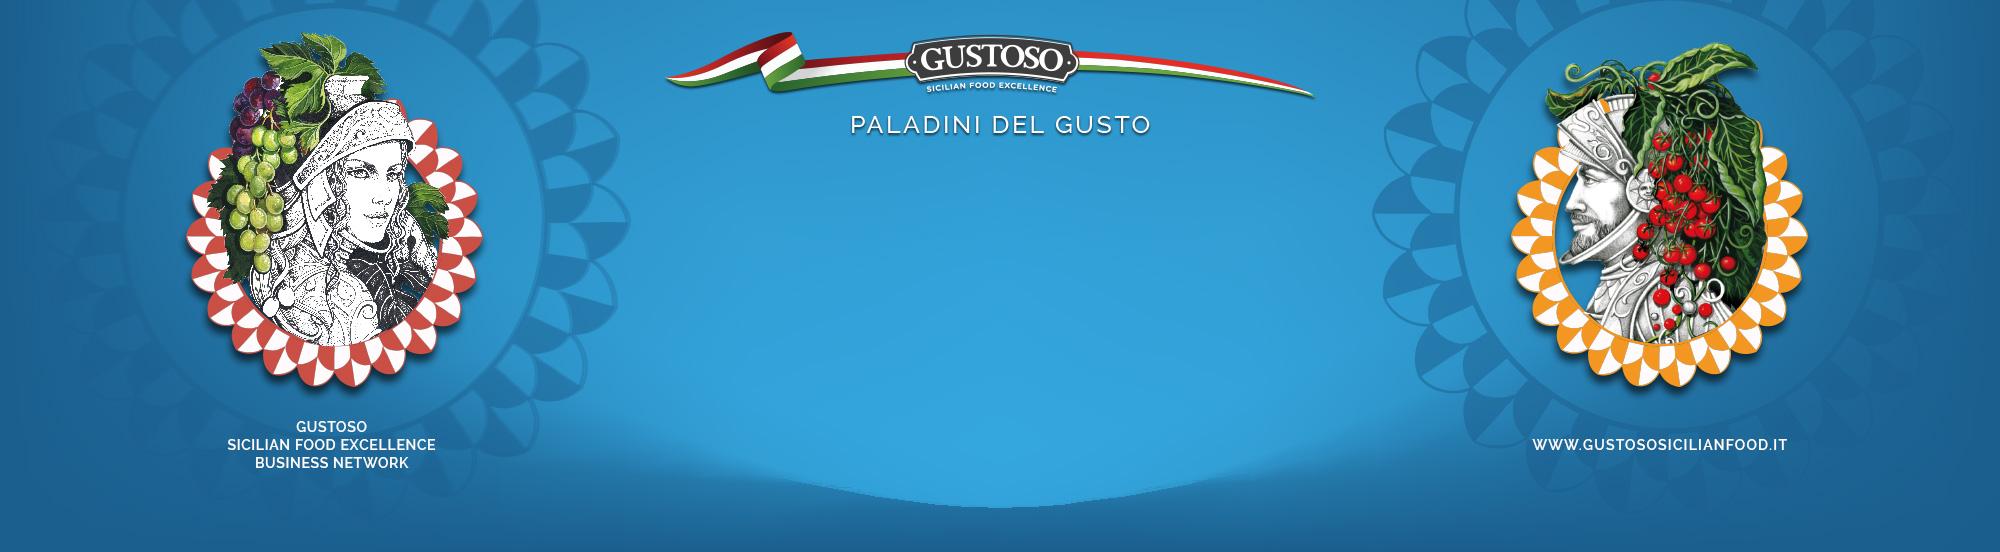 gustoso skin